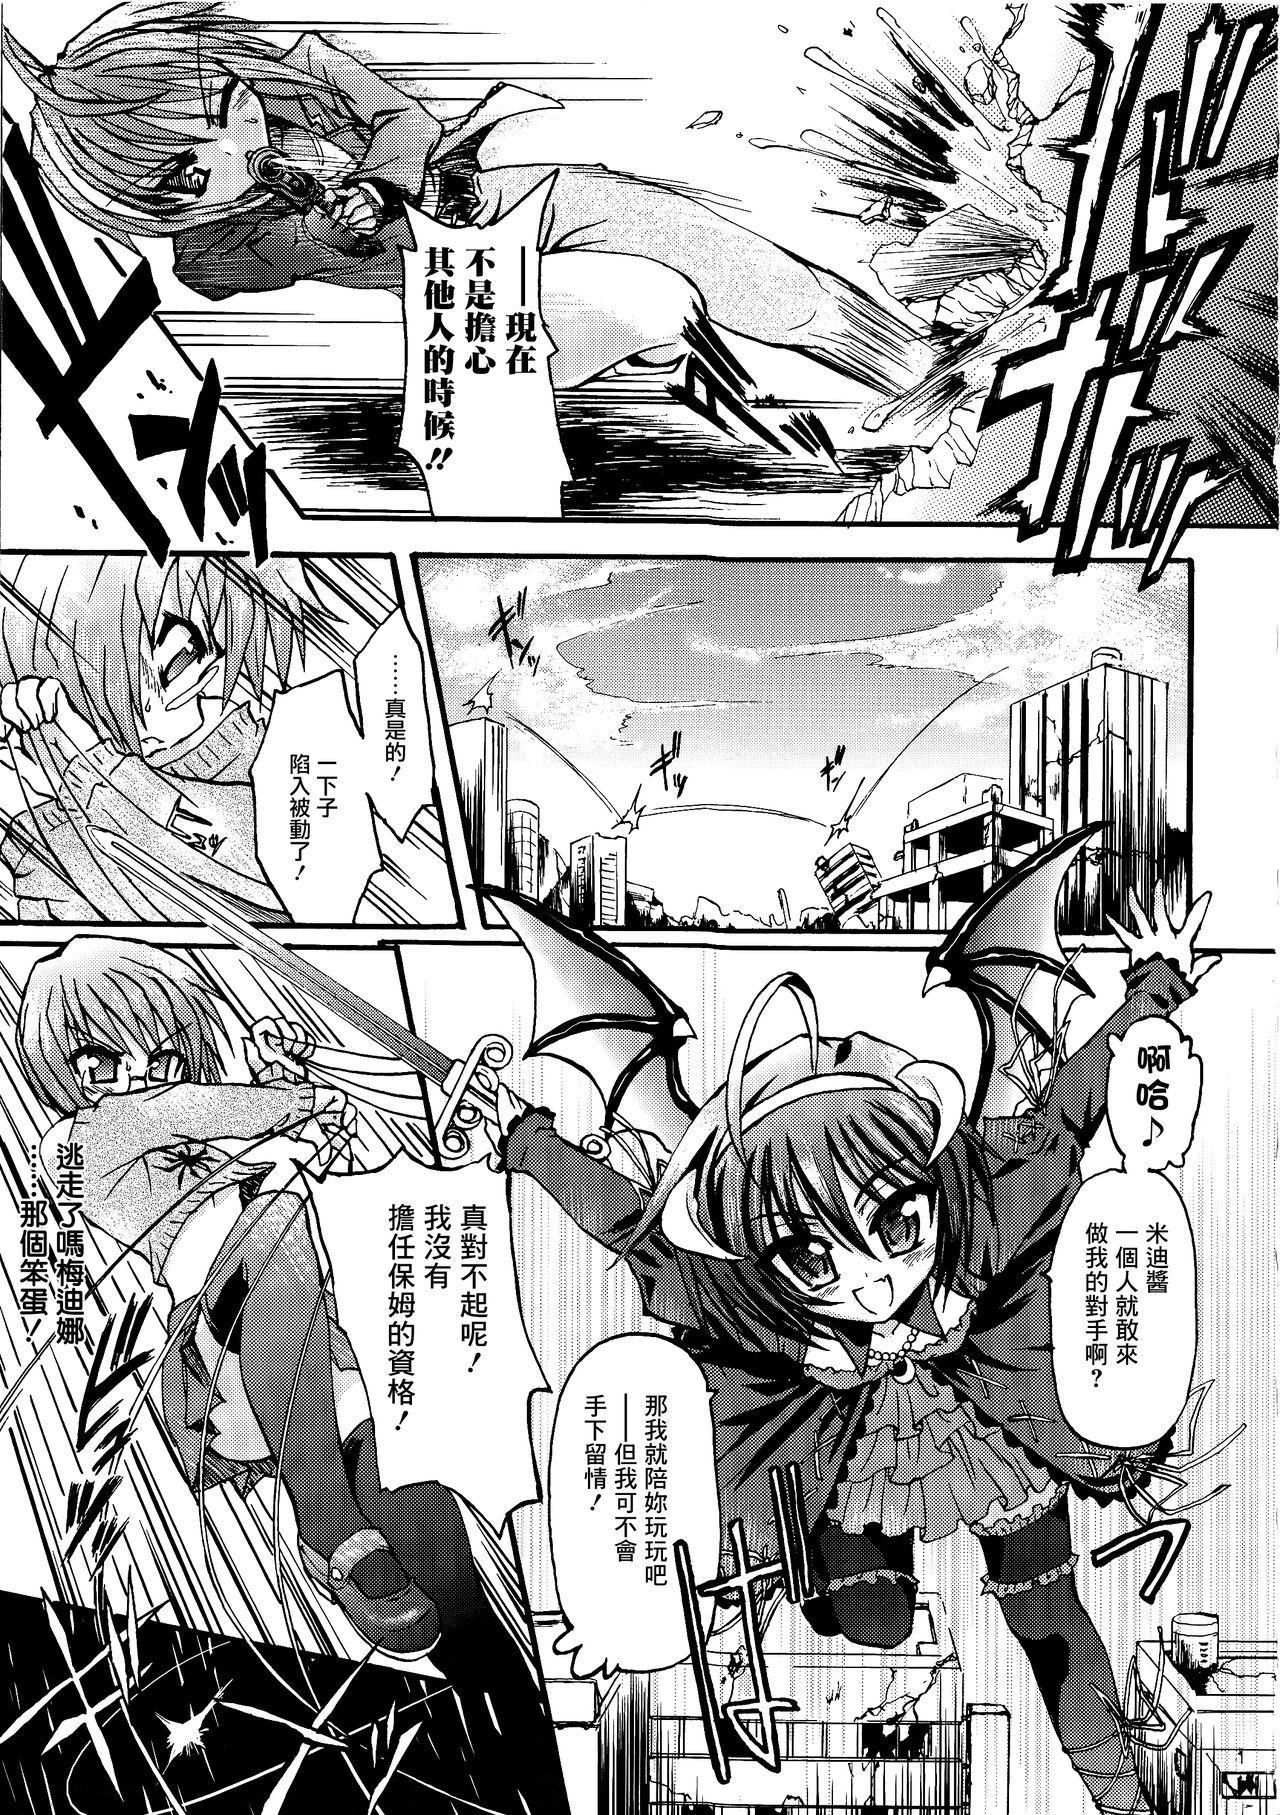 Ma ga Ochiru Yoru Demonic Imitator CH.1-7 13